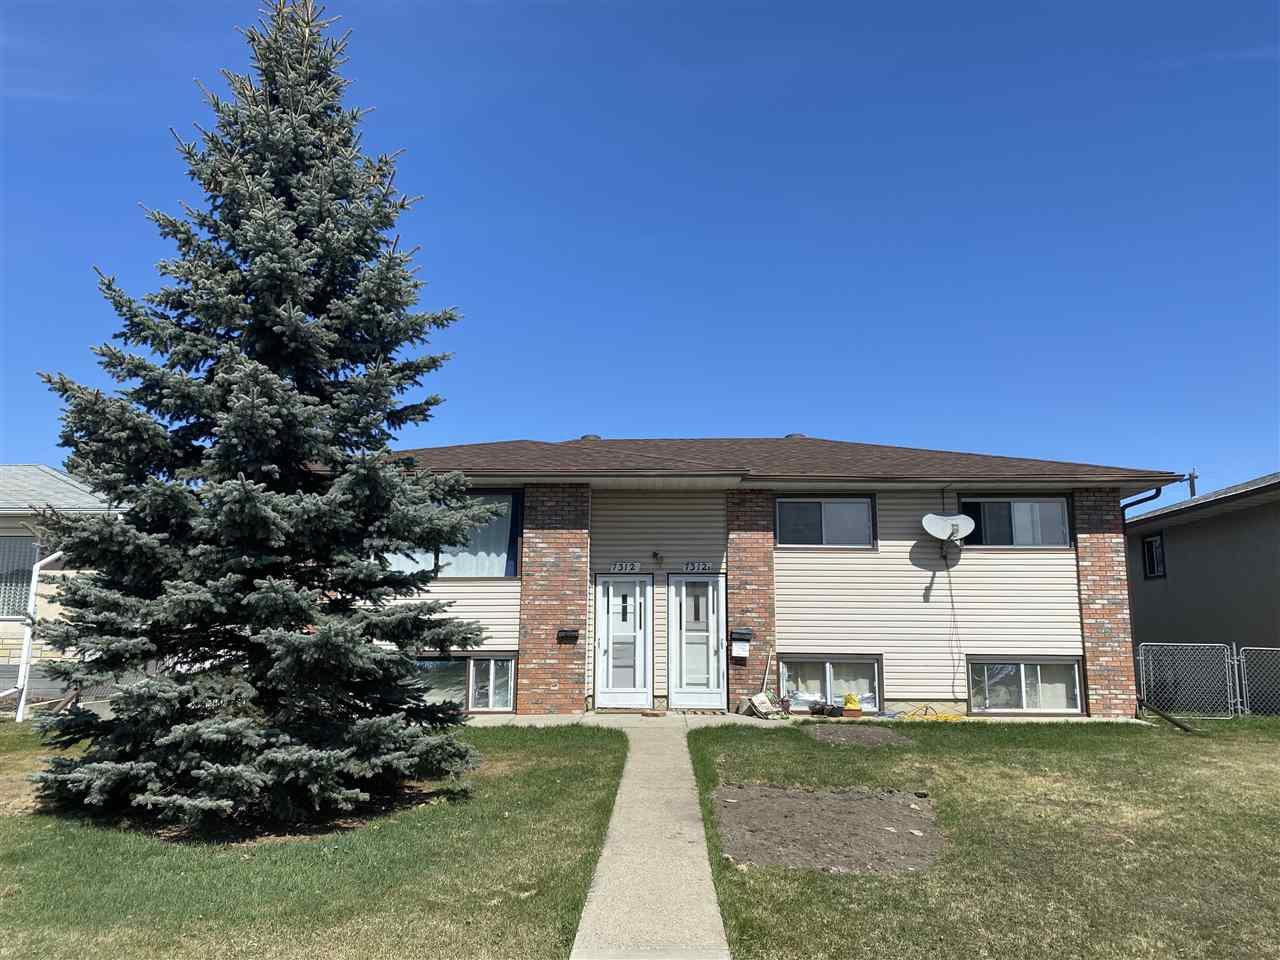 Main Photo: 7312 79 Avenue in Edmonton: Zone 17 House Duplex for sale : MLS®# E4196199